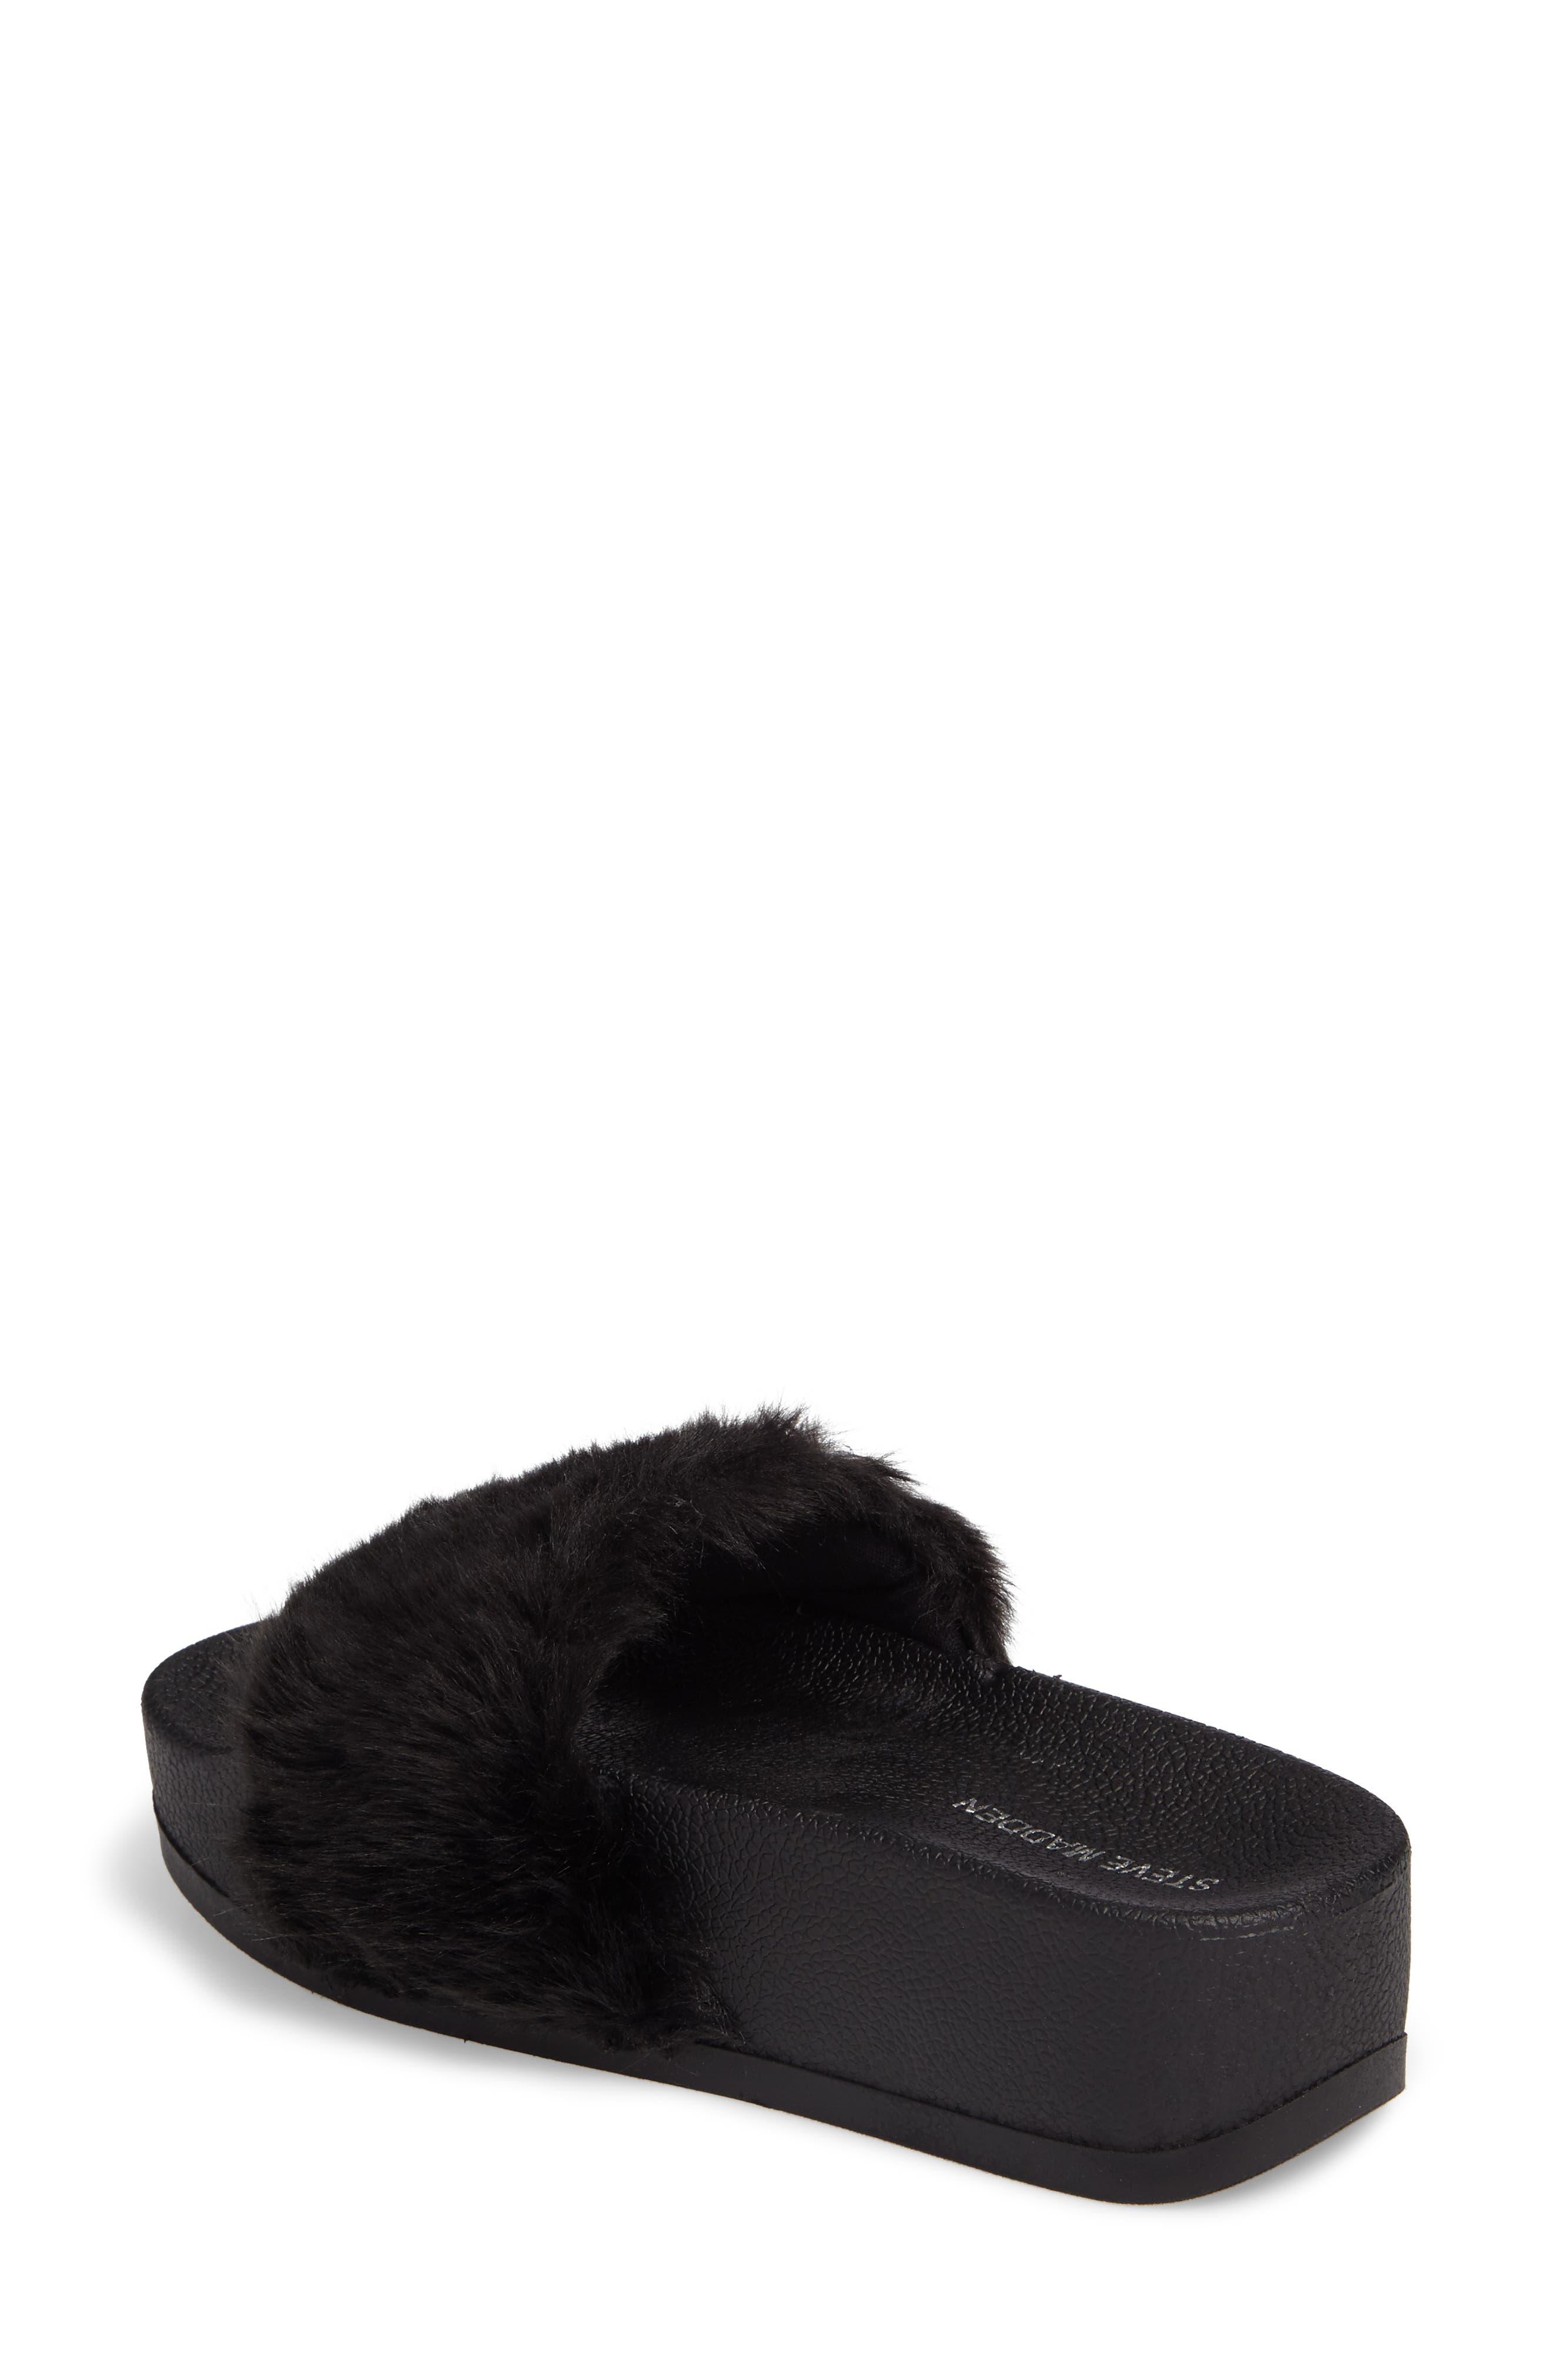 Softey Faux Fur Platform Slide,                             Alternate thumbnail 2, color,                             001